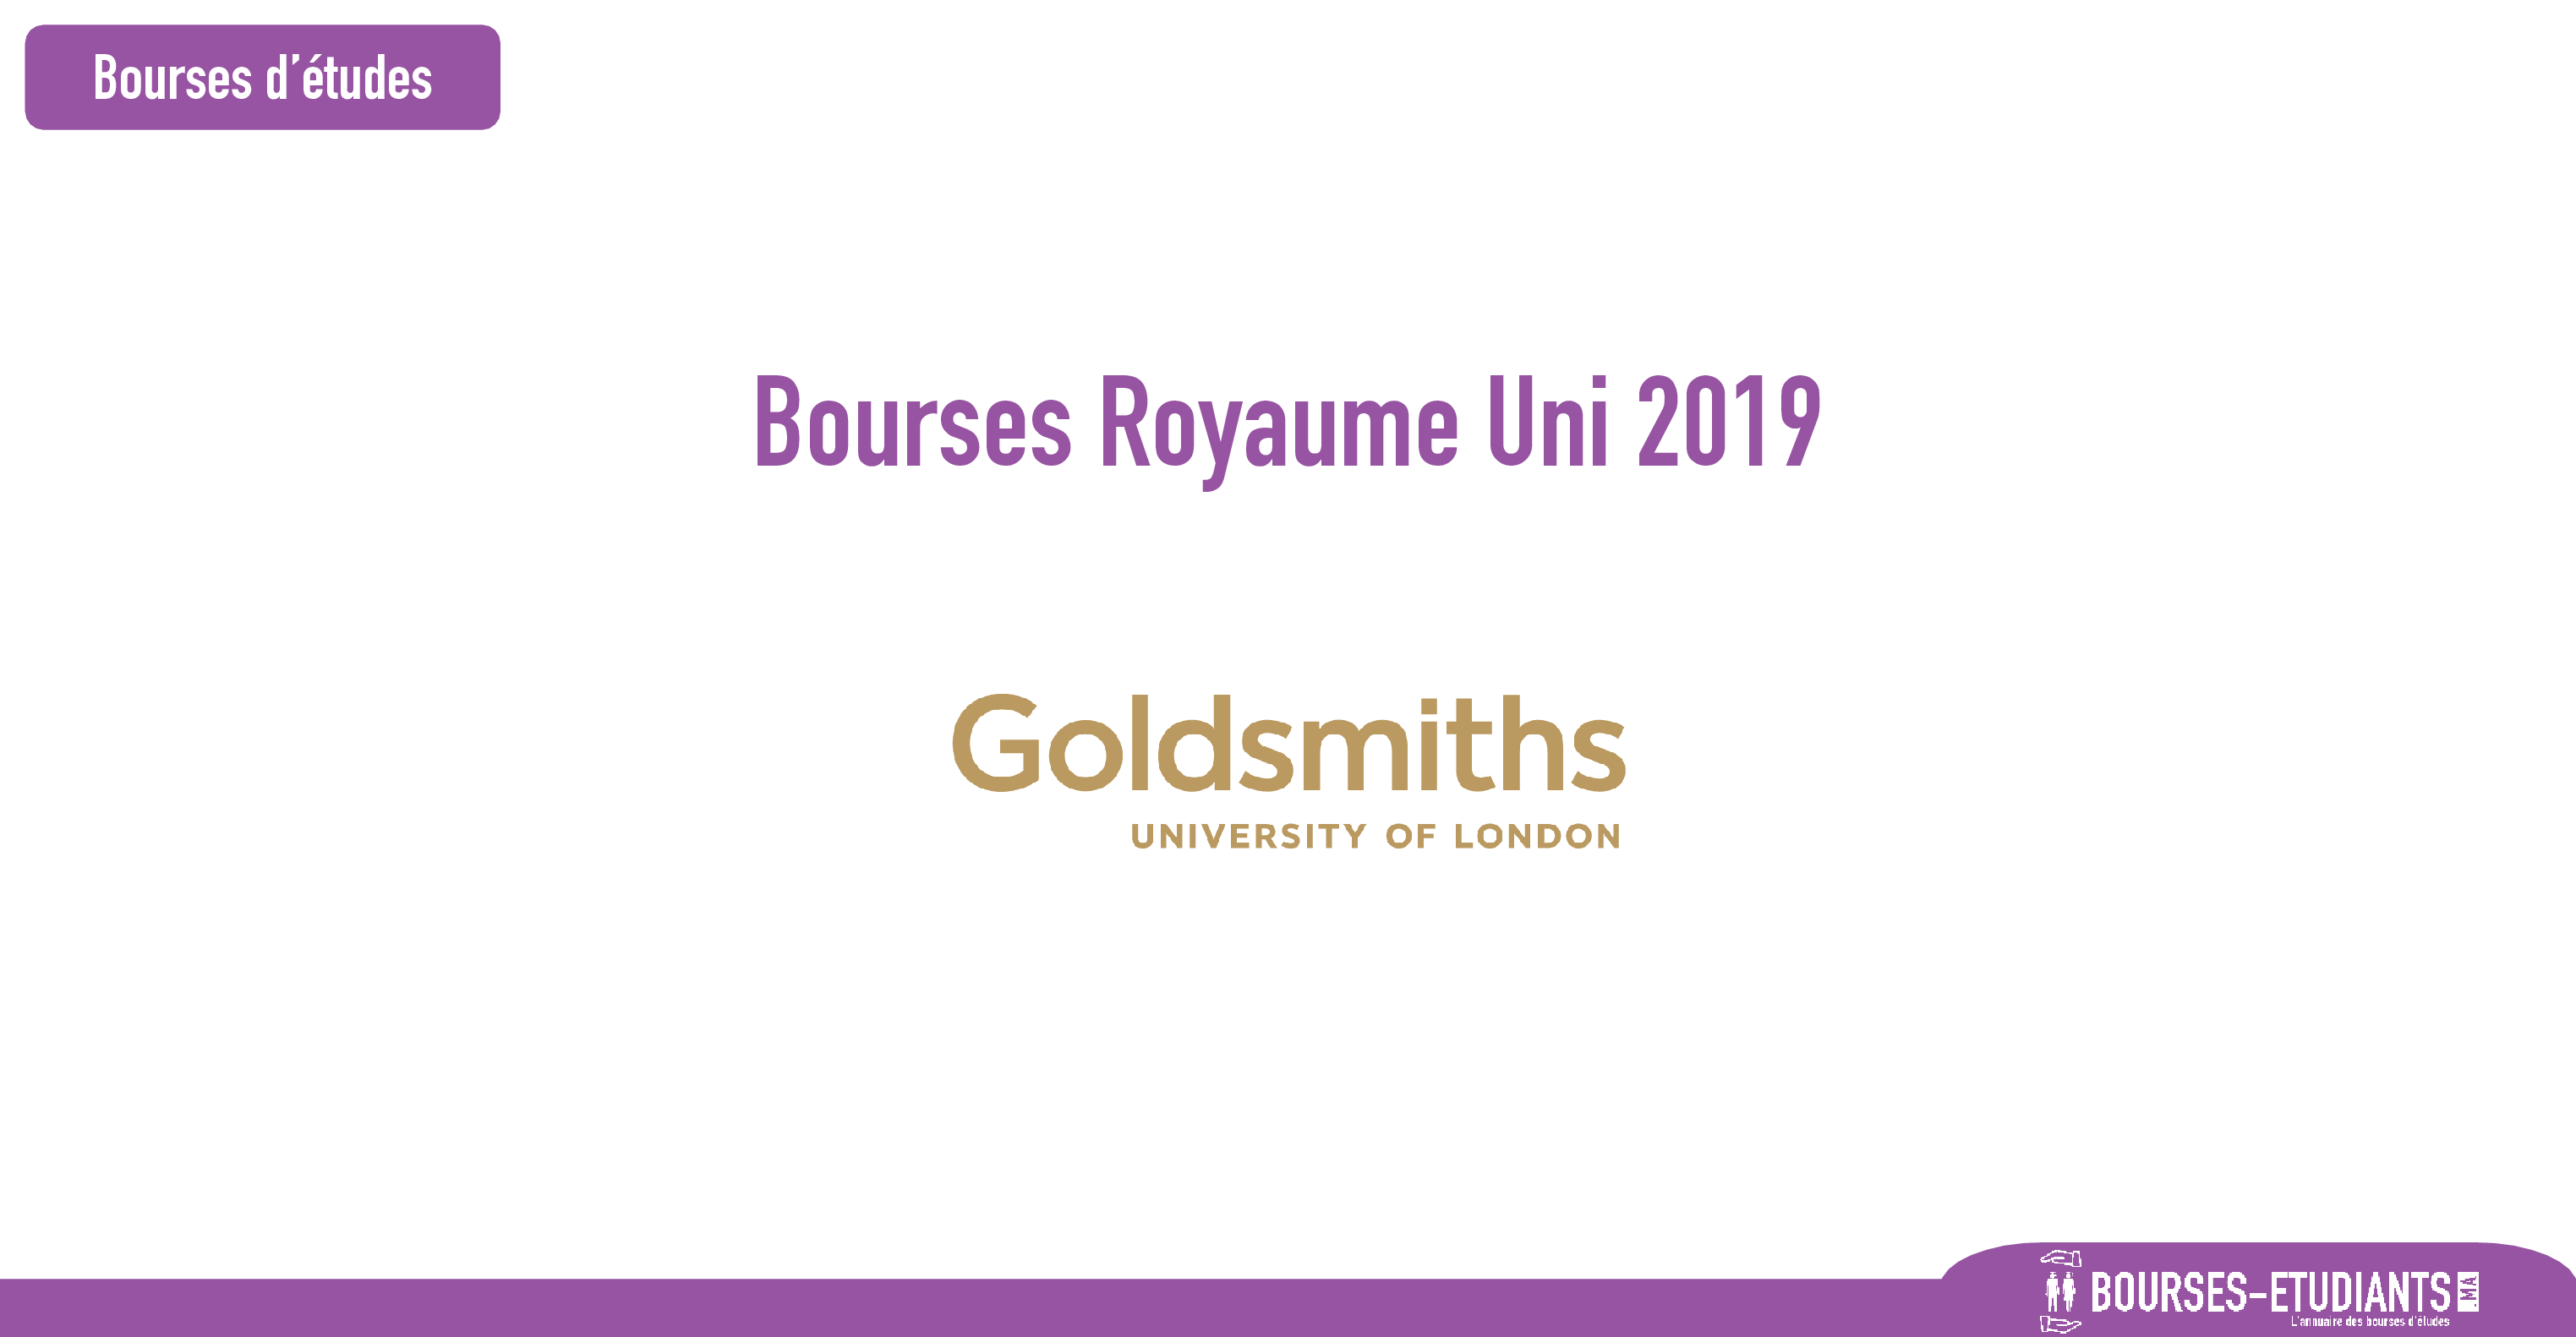 bourse Goldsmiths